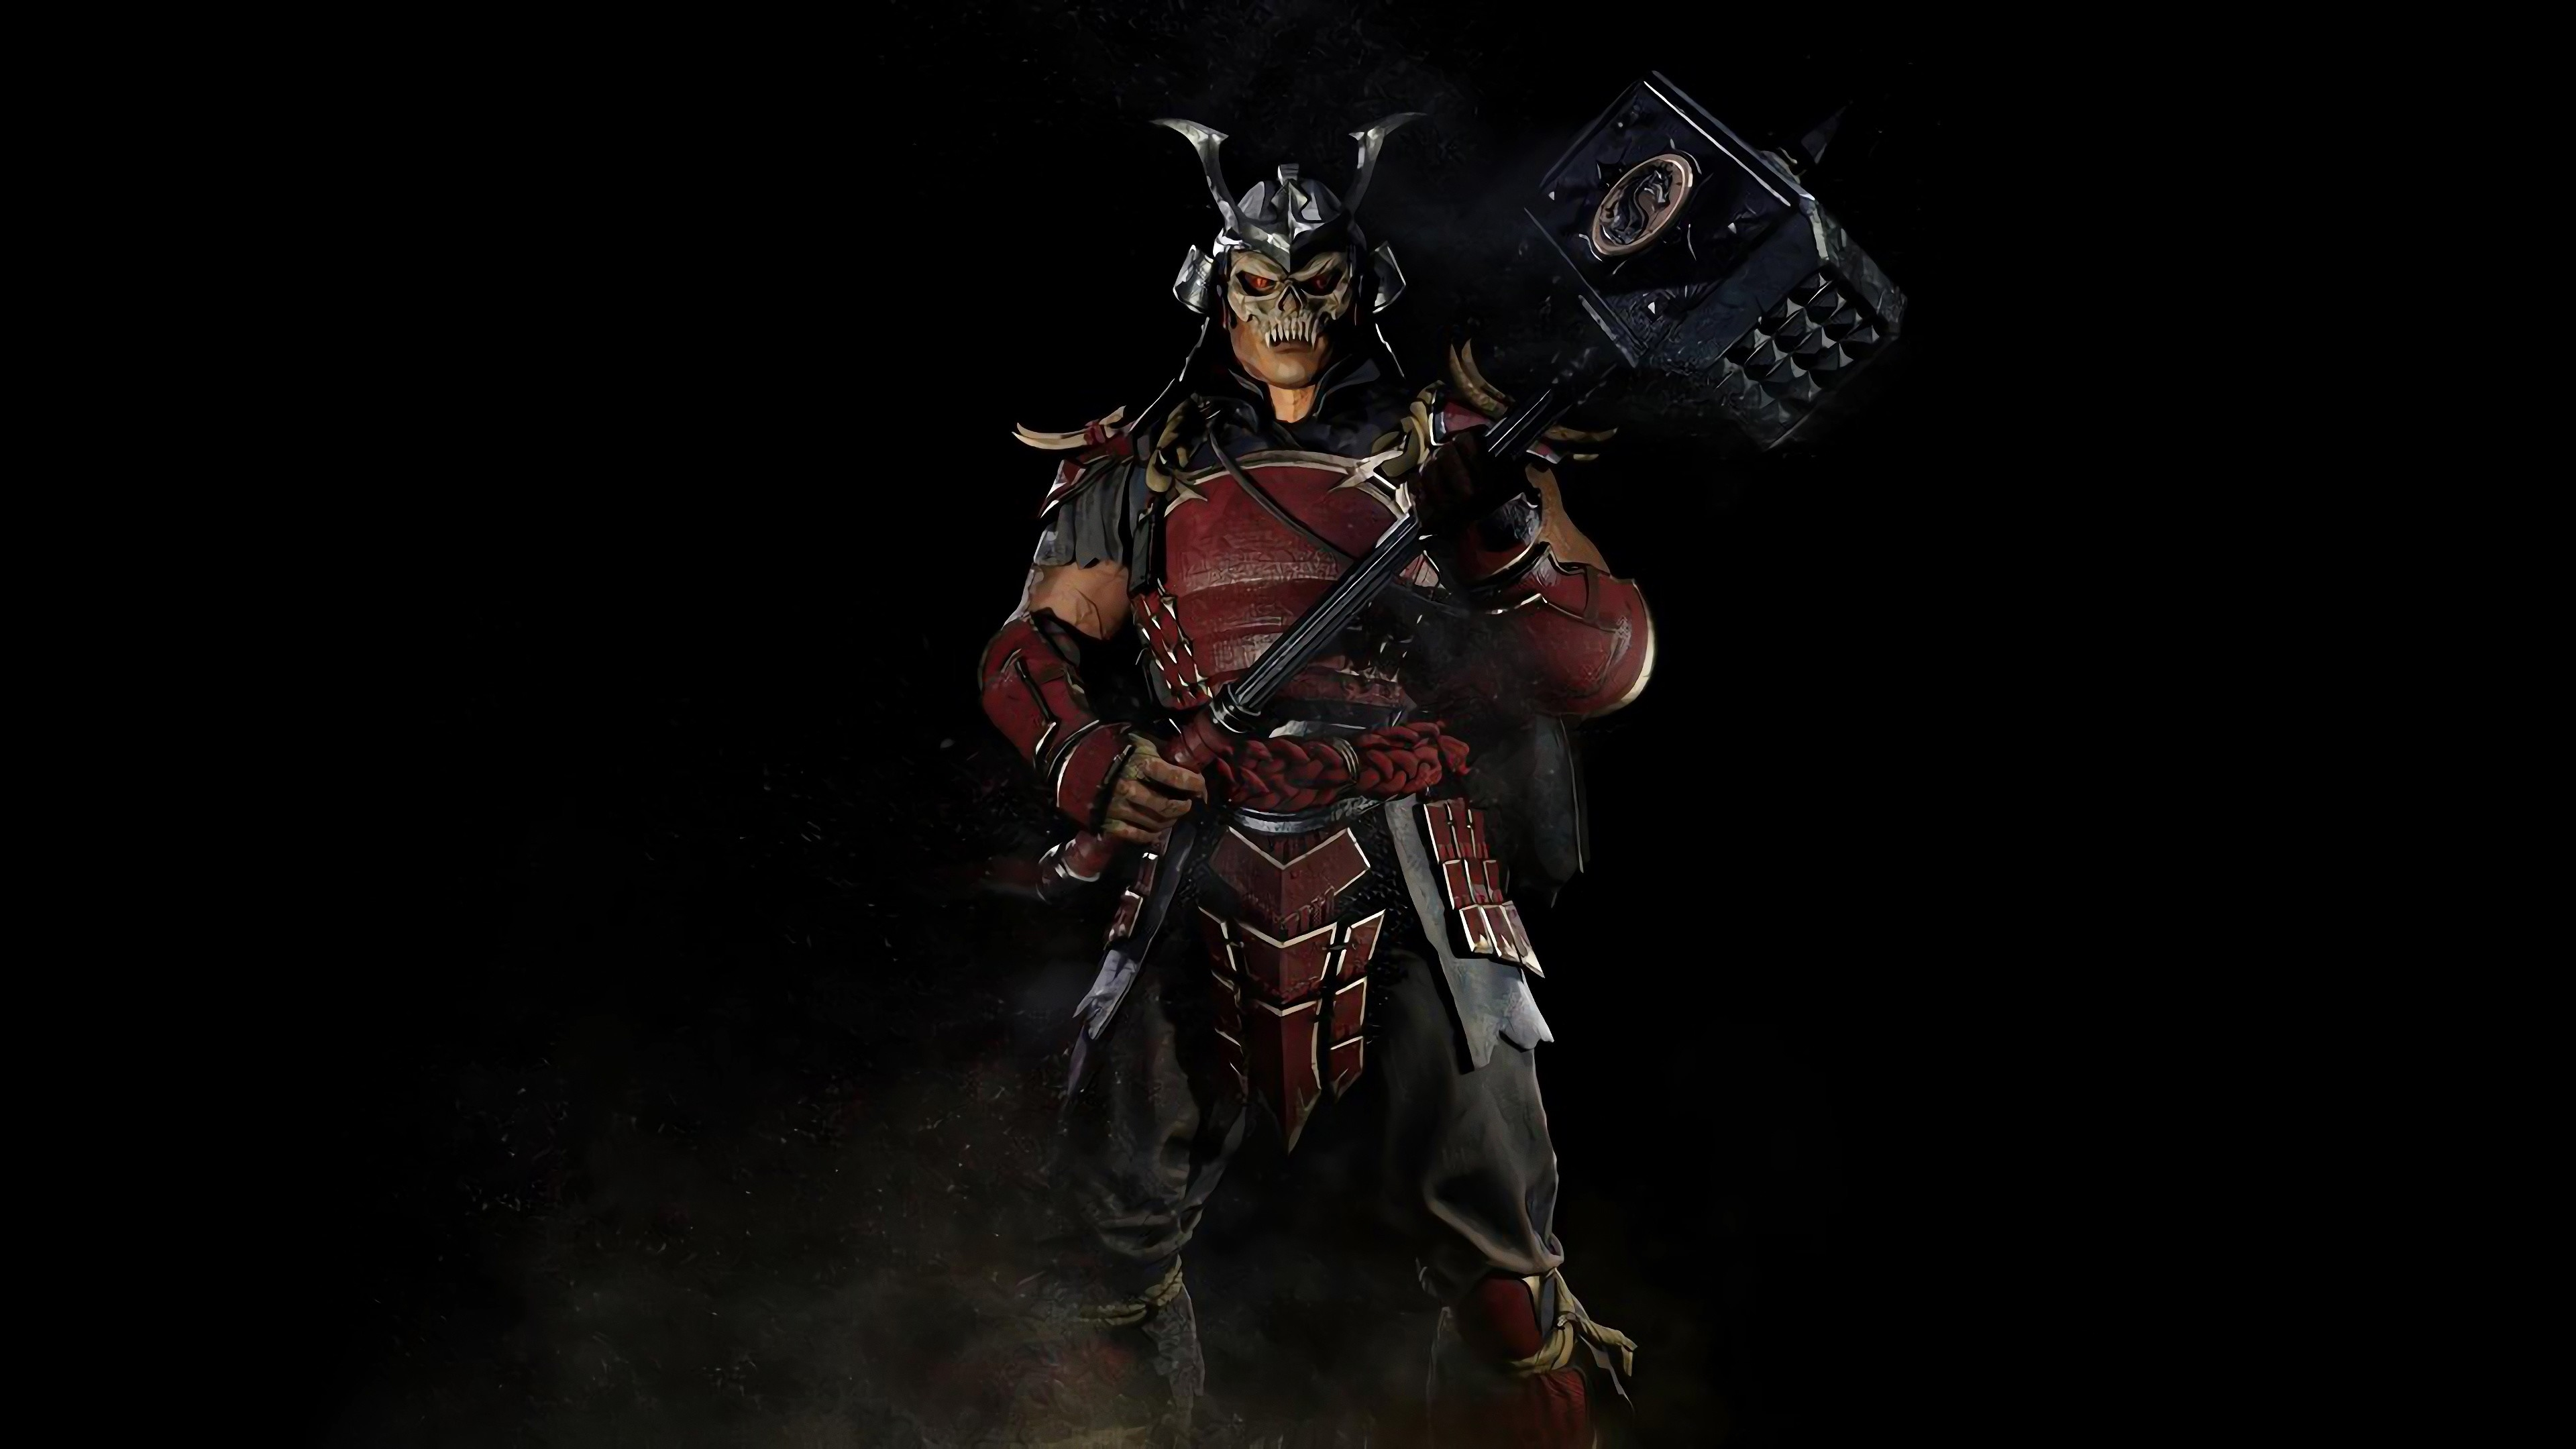 Mk11 4k Wallpaper: Shao Kahn In Mortal Kombat 11 Wallpaper, HD Games 4K